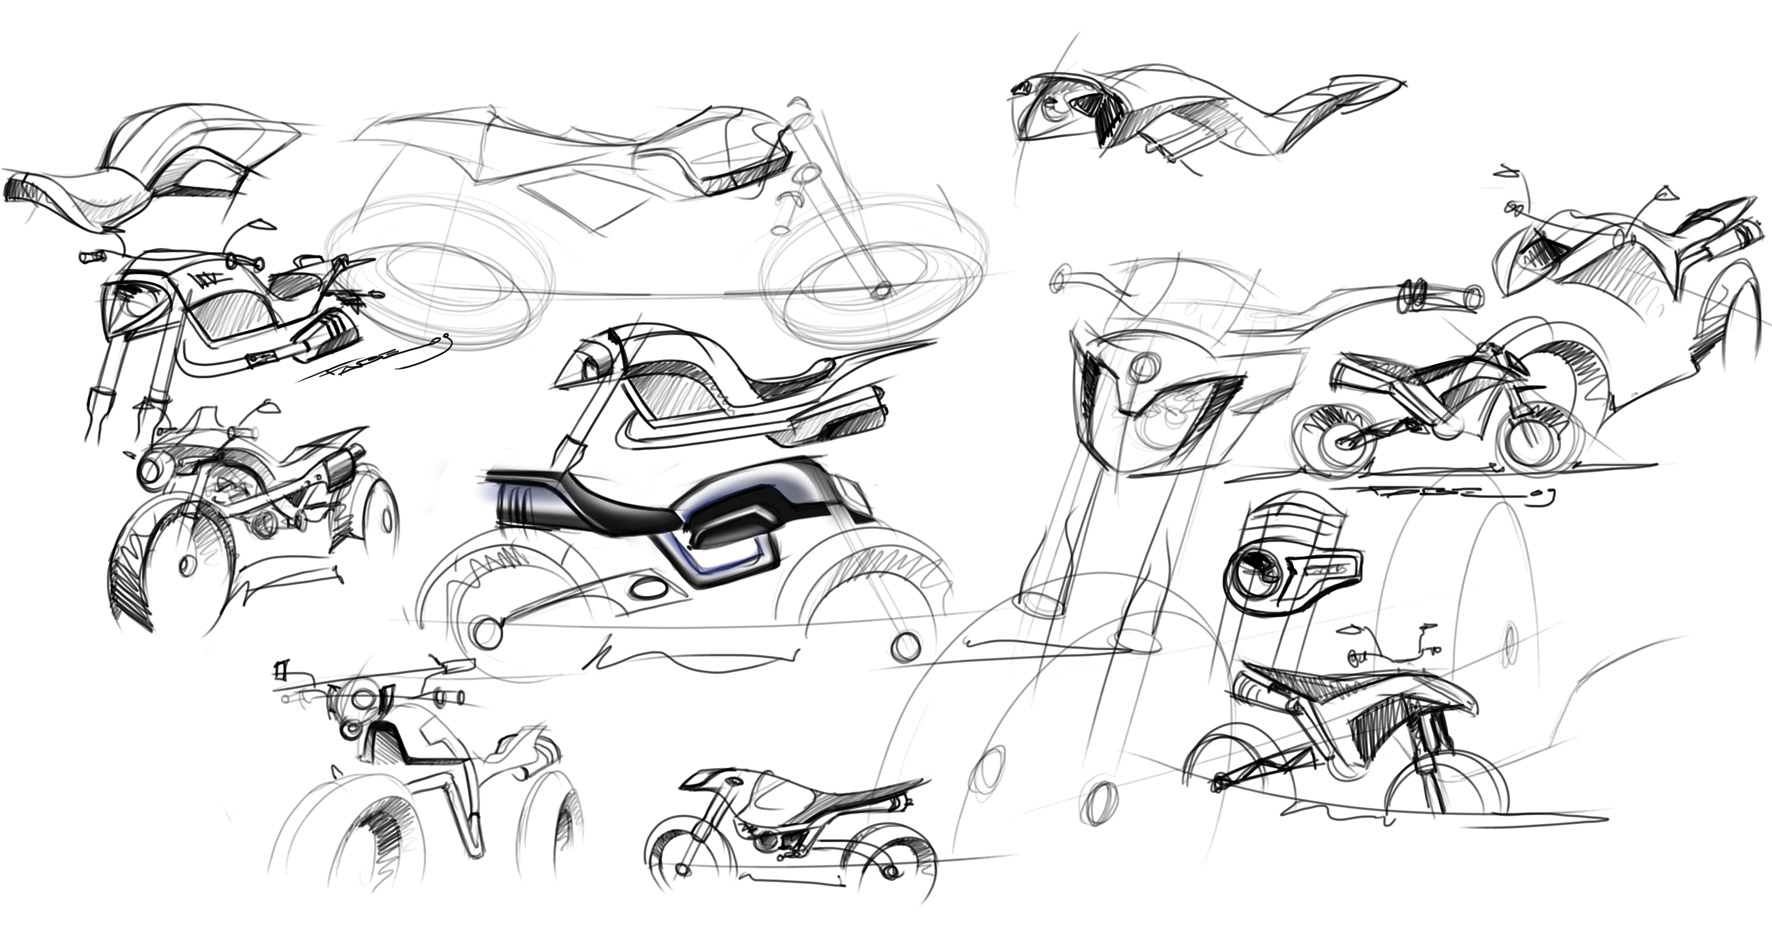 10 09 S U M Concept Sport Utility Motorcycle